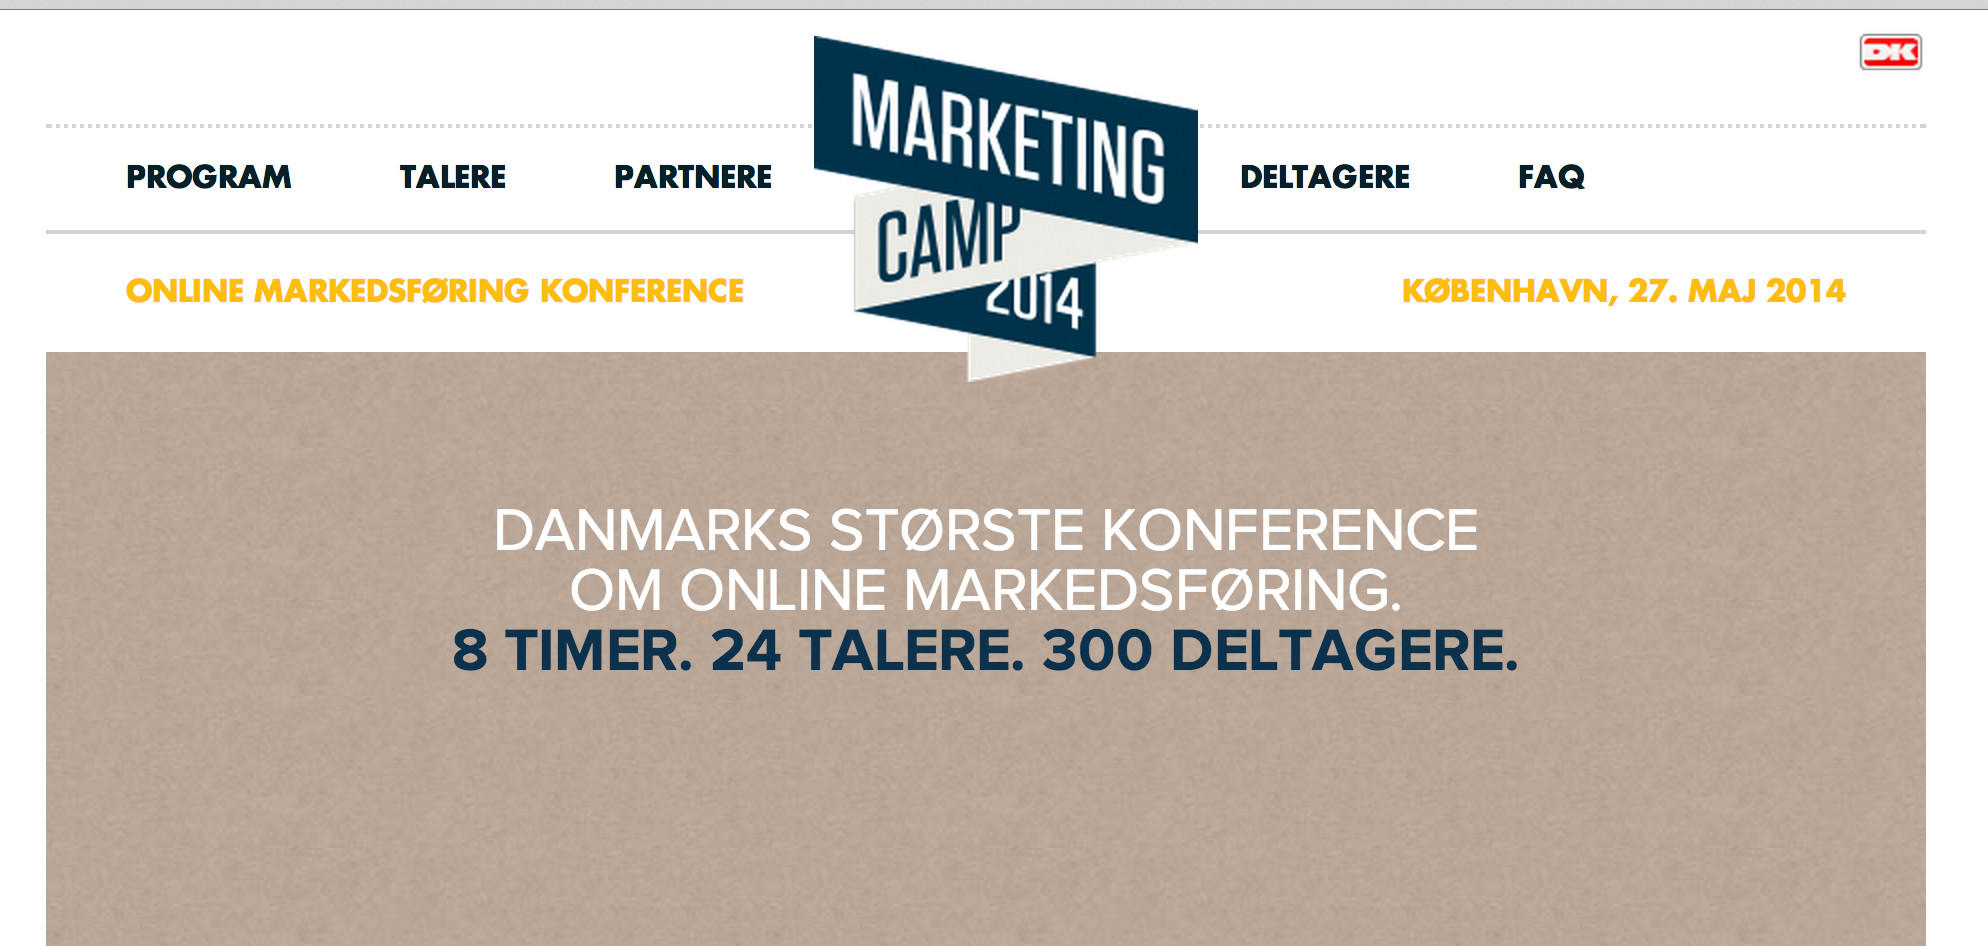 Marketing Camp 2014